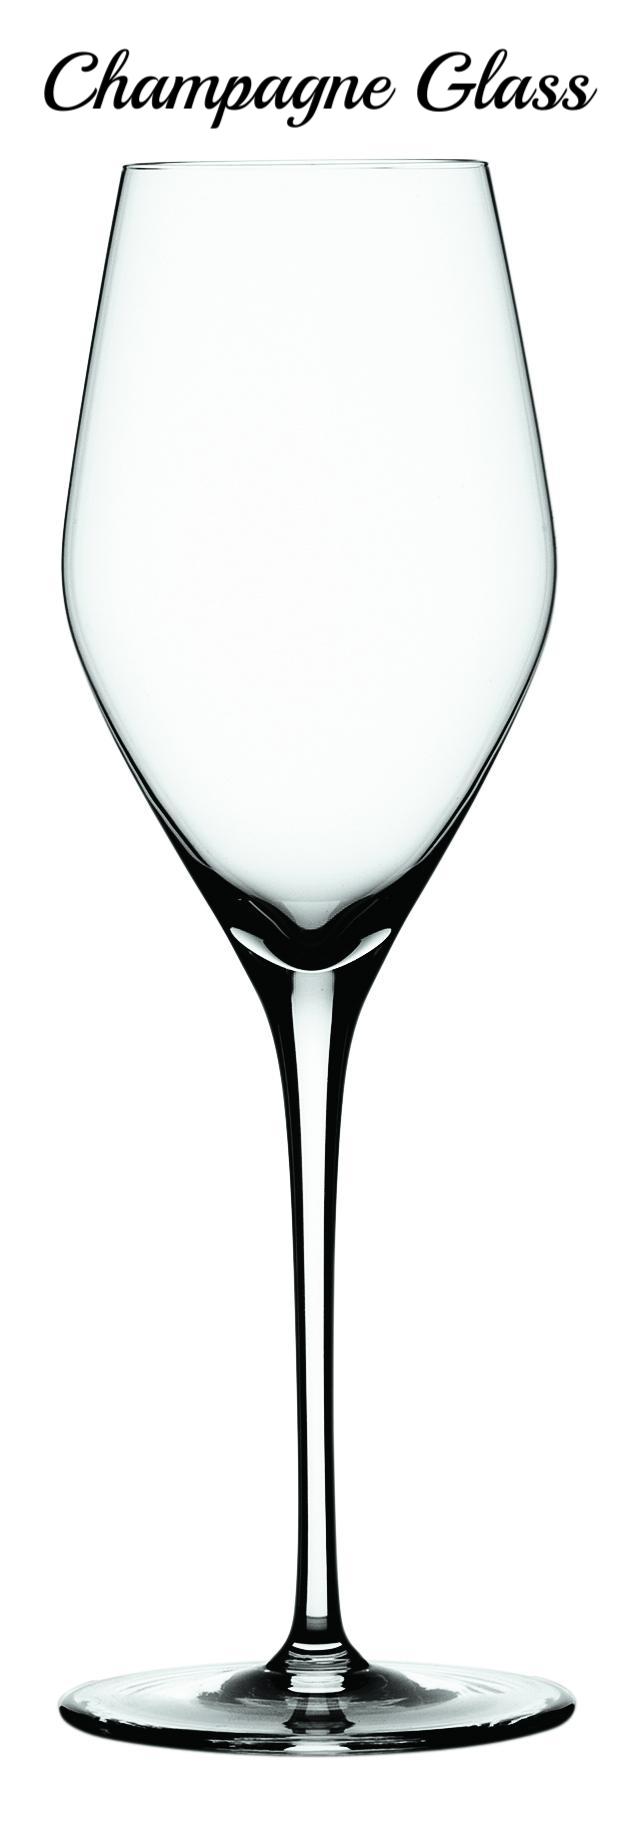 Authentis Champ Glass 4408029.jpg